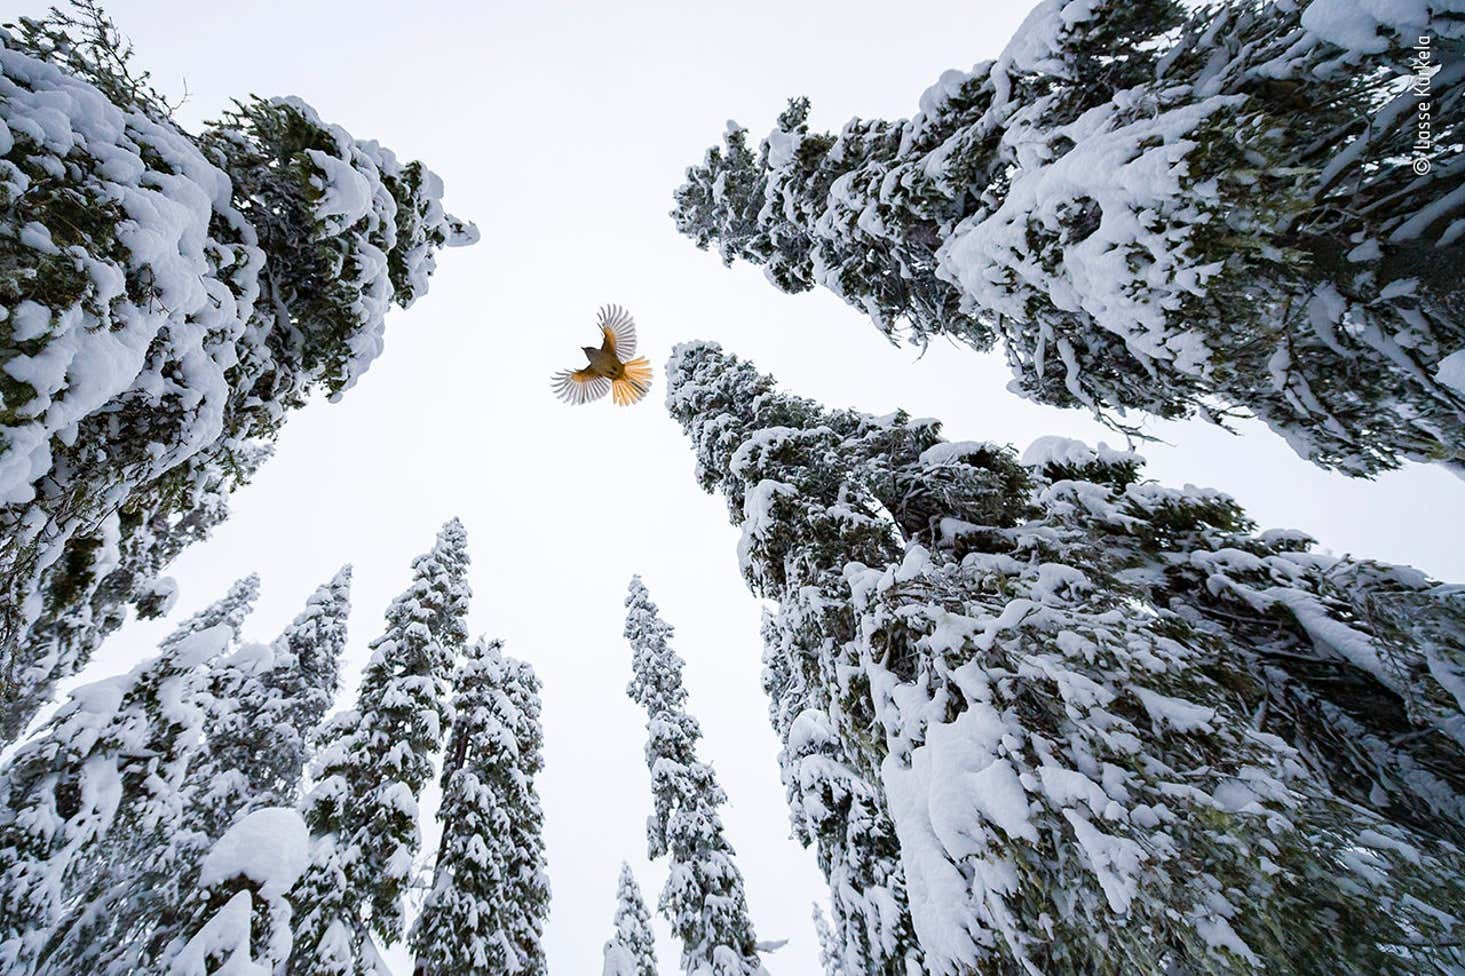 Lasse Kurkela Wildlife Photographer Of The Year